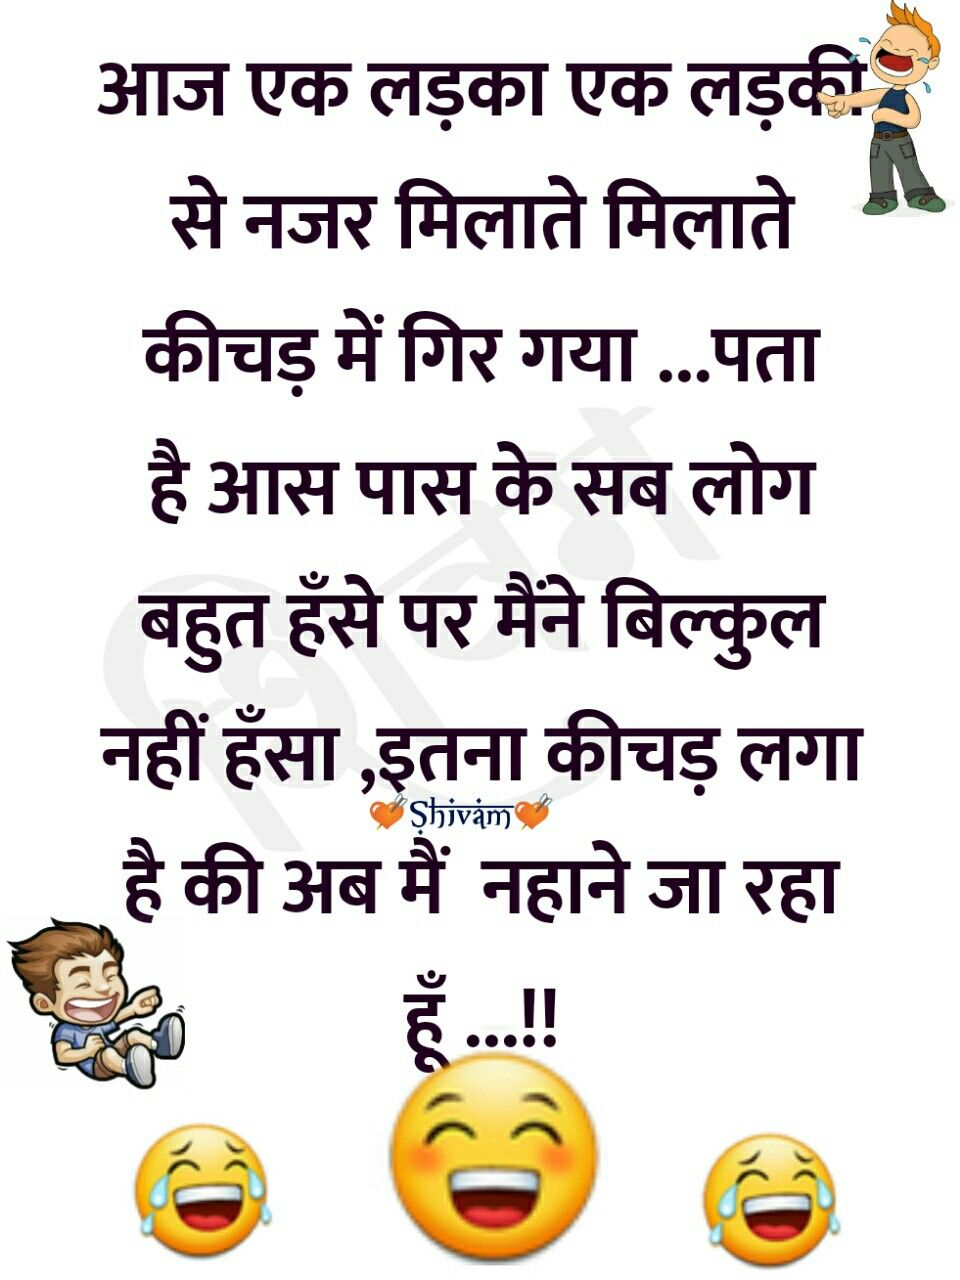 Joke jokeInHindi hindijoke ShivamR7 joke in hindi